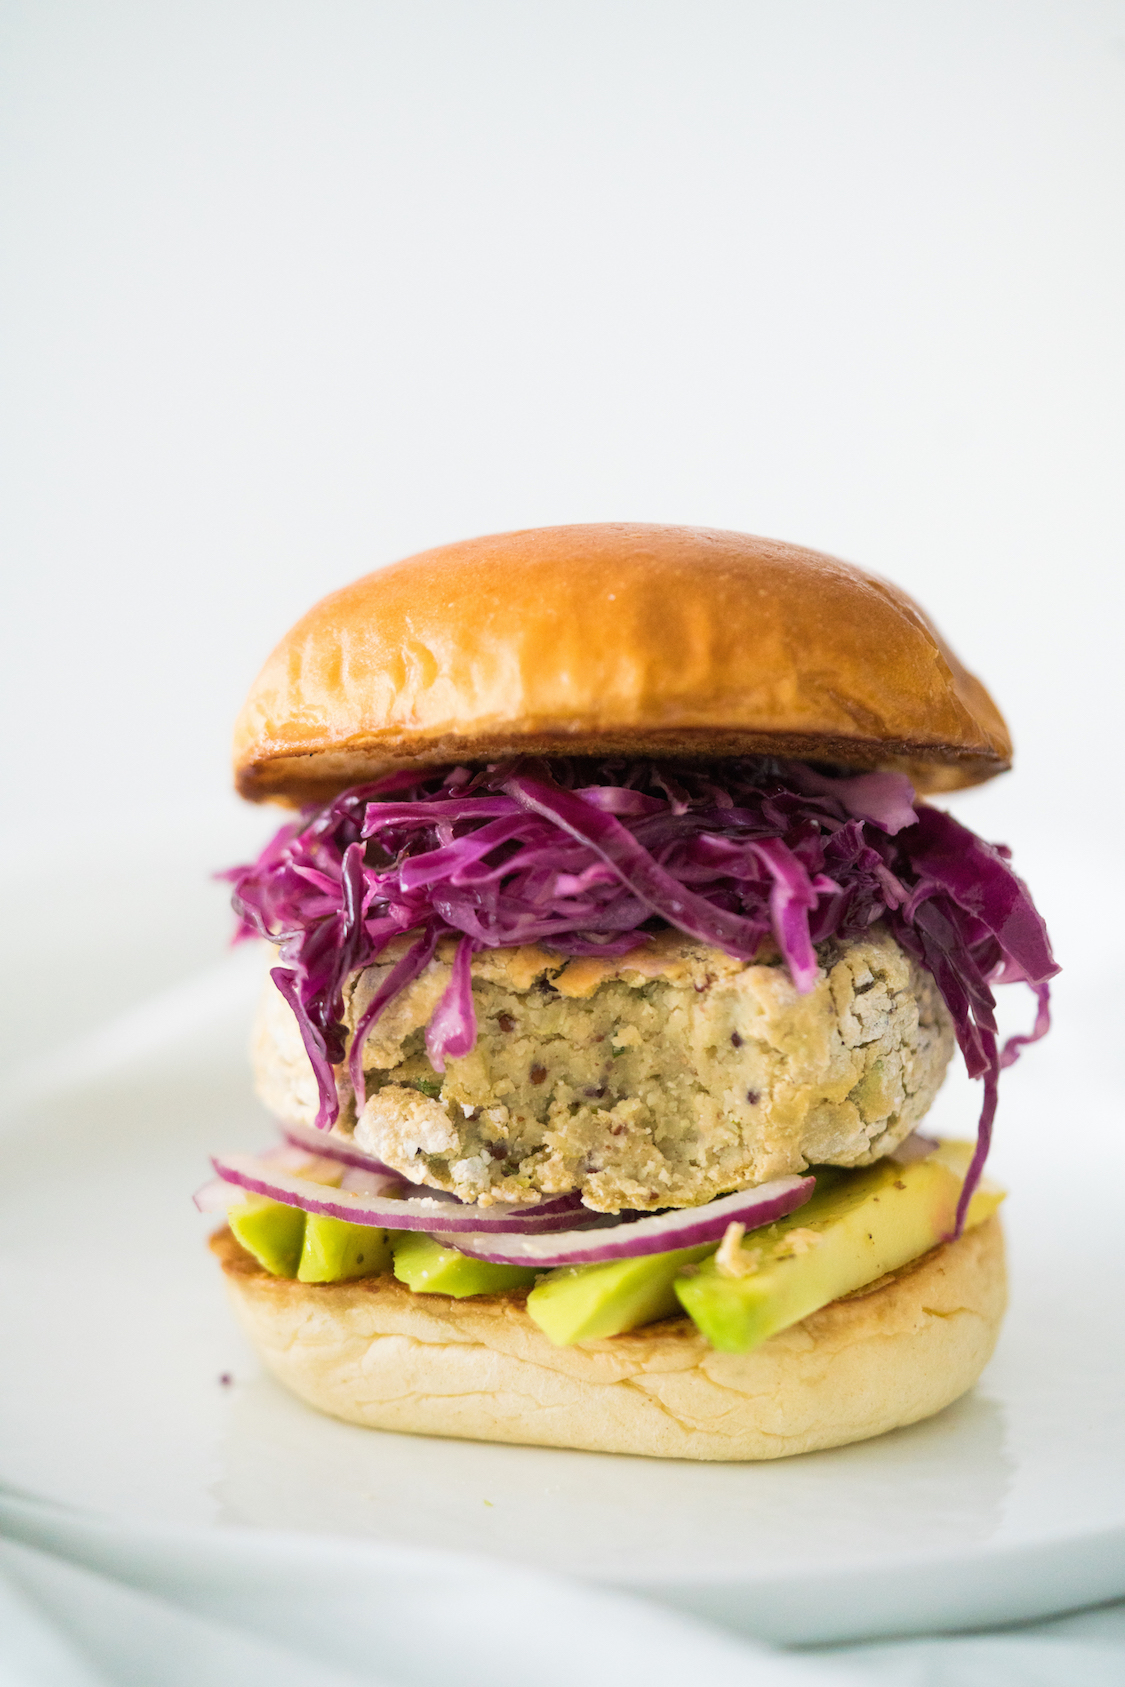 receita-hamburguer-vegetariano-dani-noce-fit-1